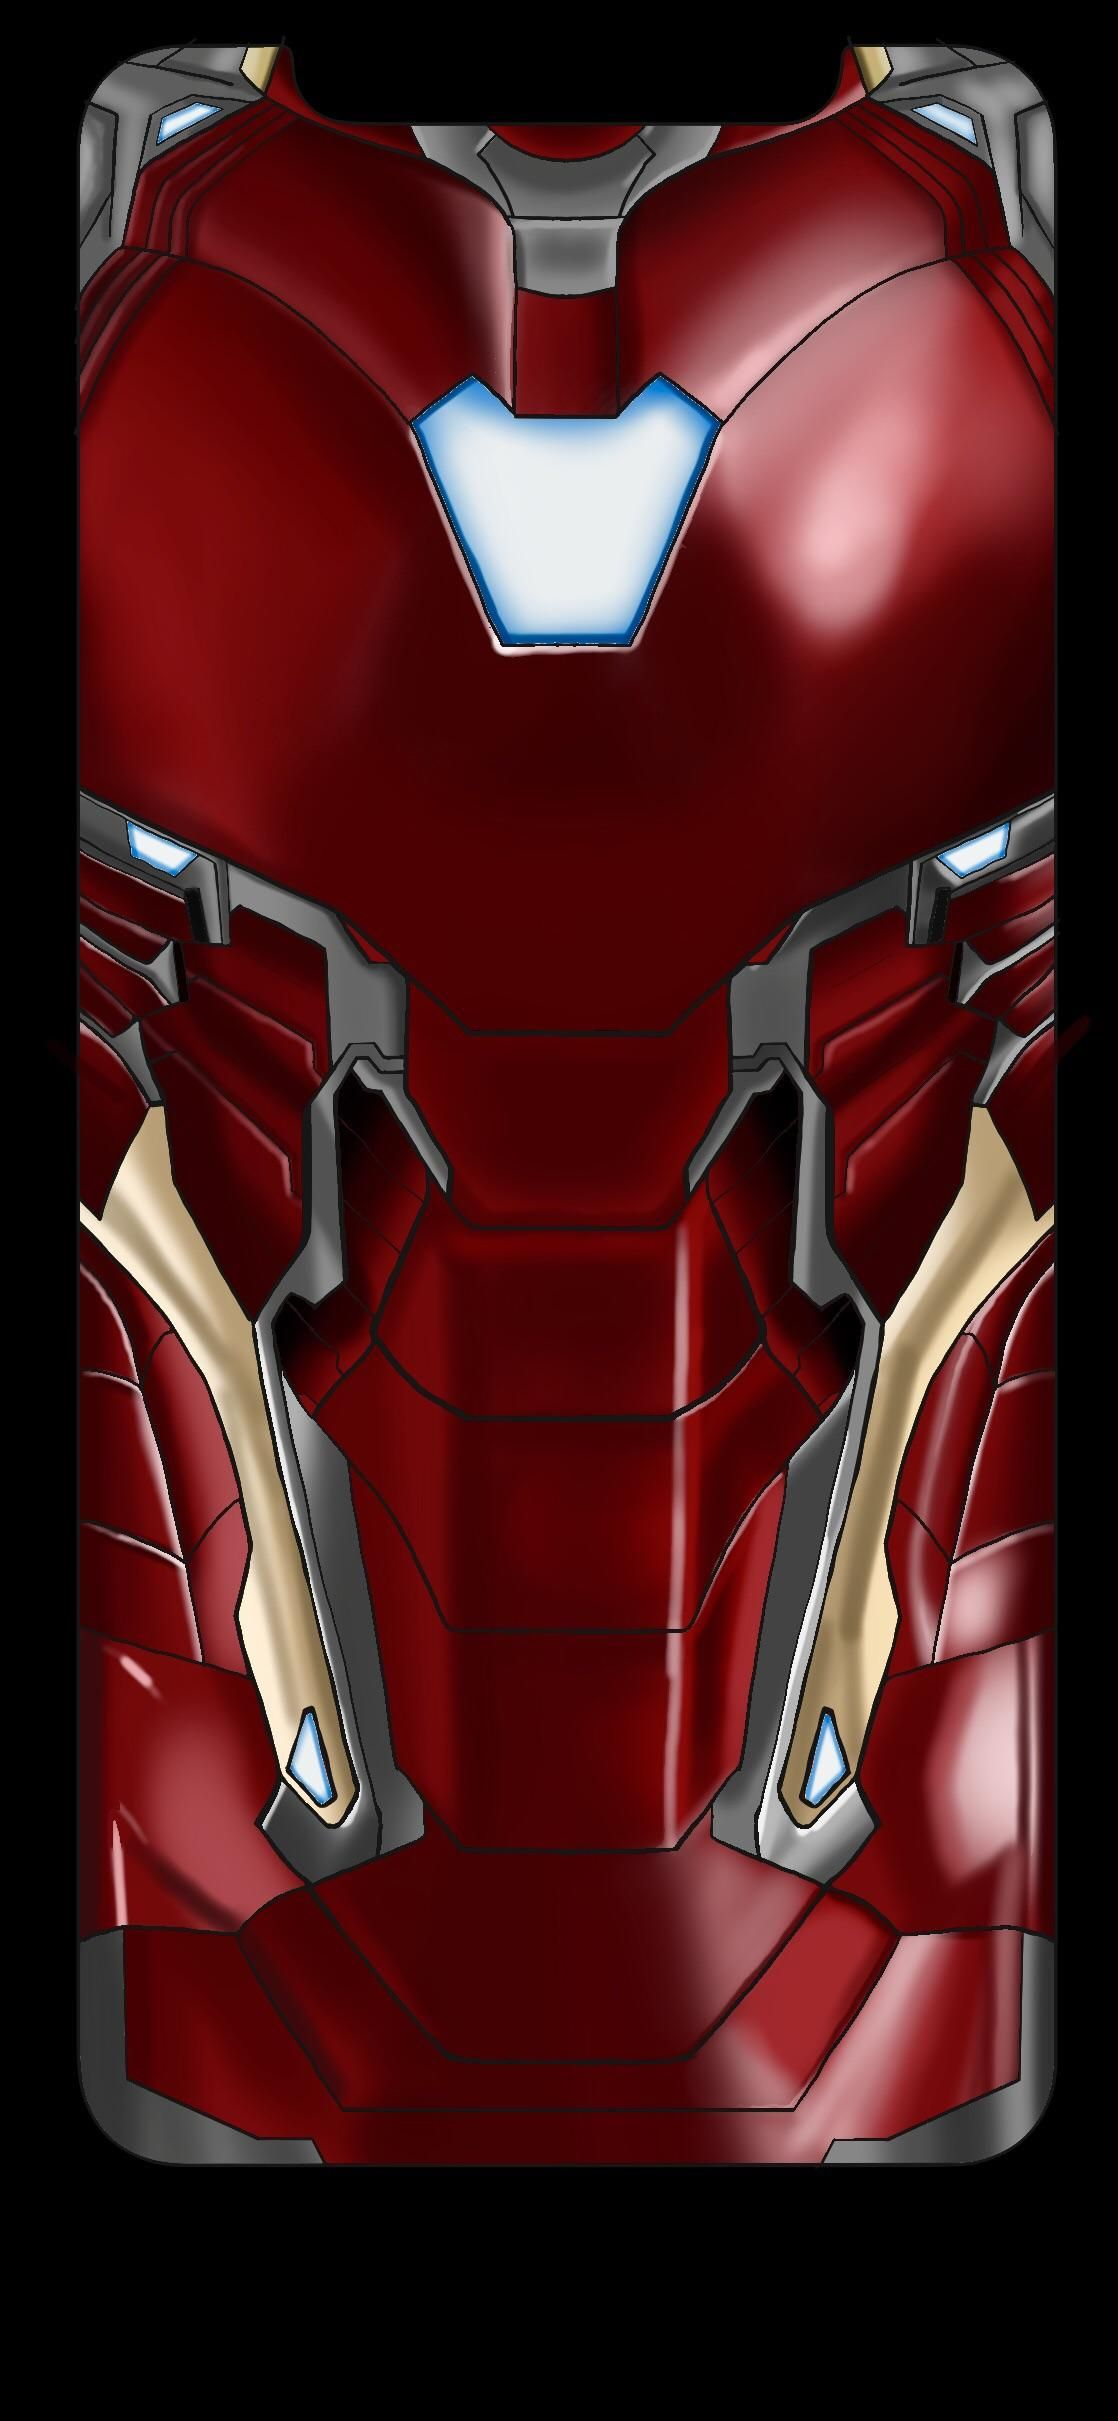 Mr Stank Iphone X Wallpapers Iphonexwallpaper Superman Wallpaper Logo Iron Man Wallpaper Superhero Wallpaper